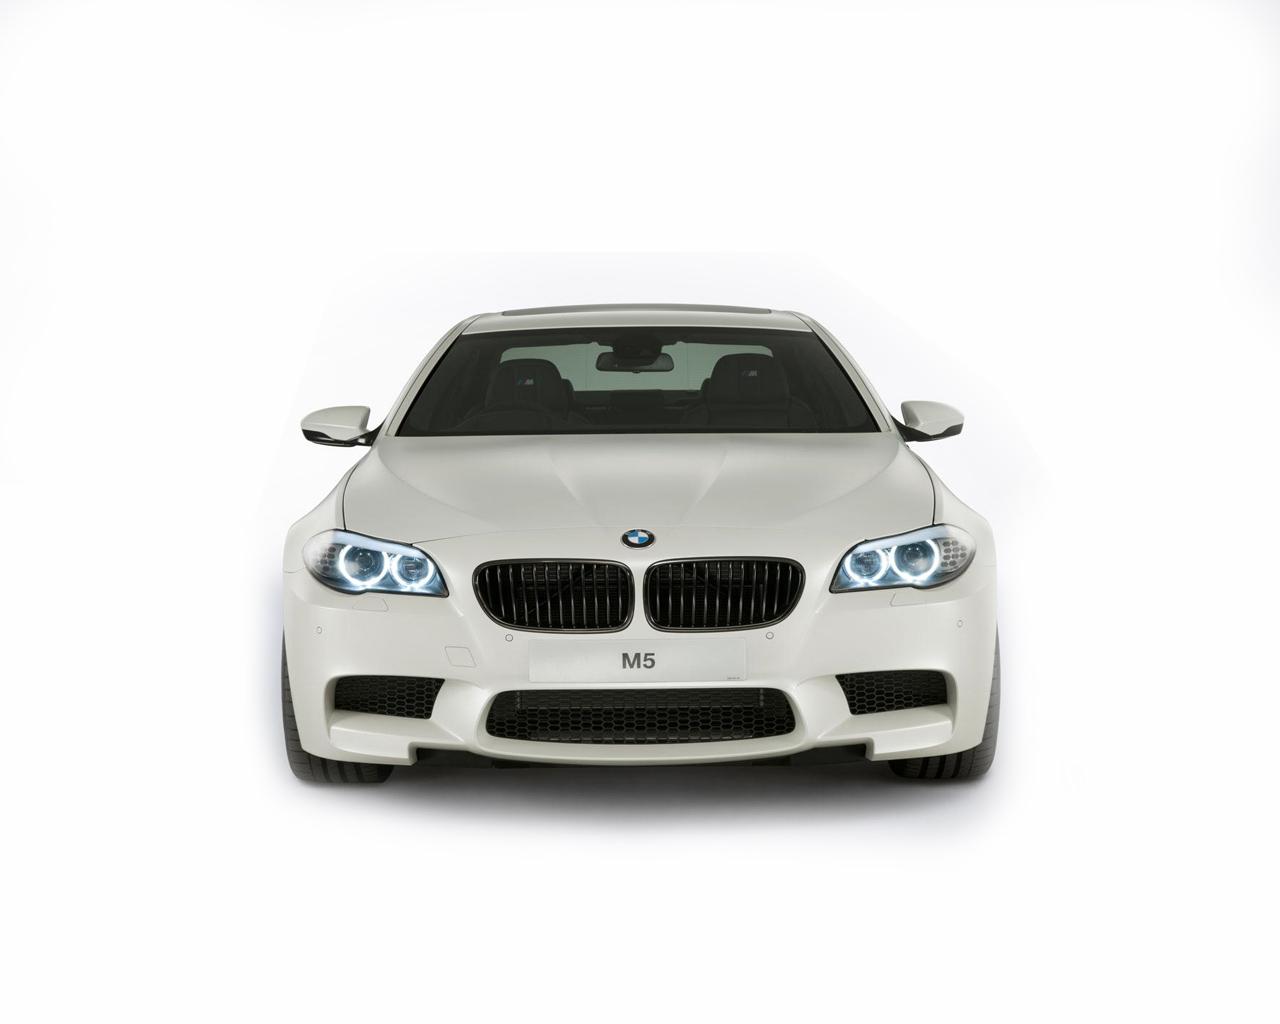 Luxury Vehicle: Craze For Cars » Top 10 Best Luxury Cars Under $40,000